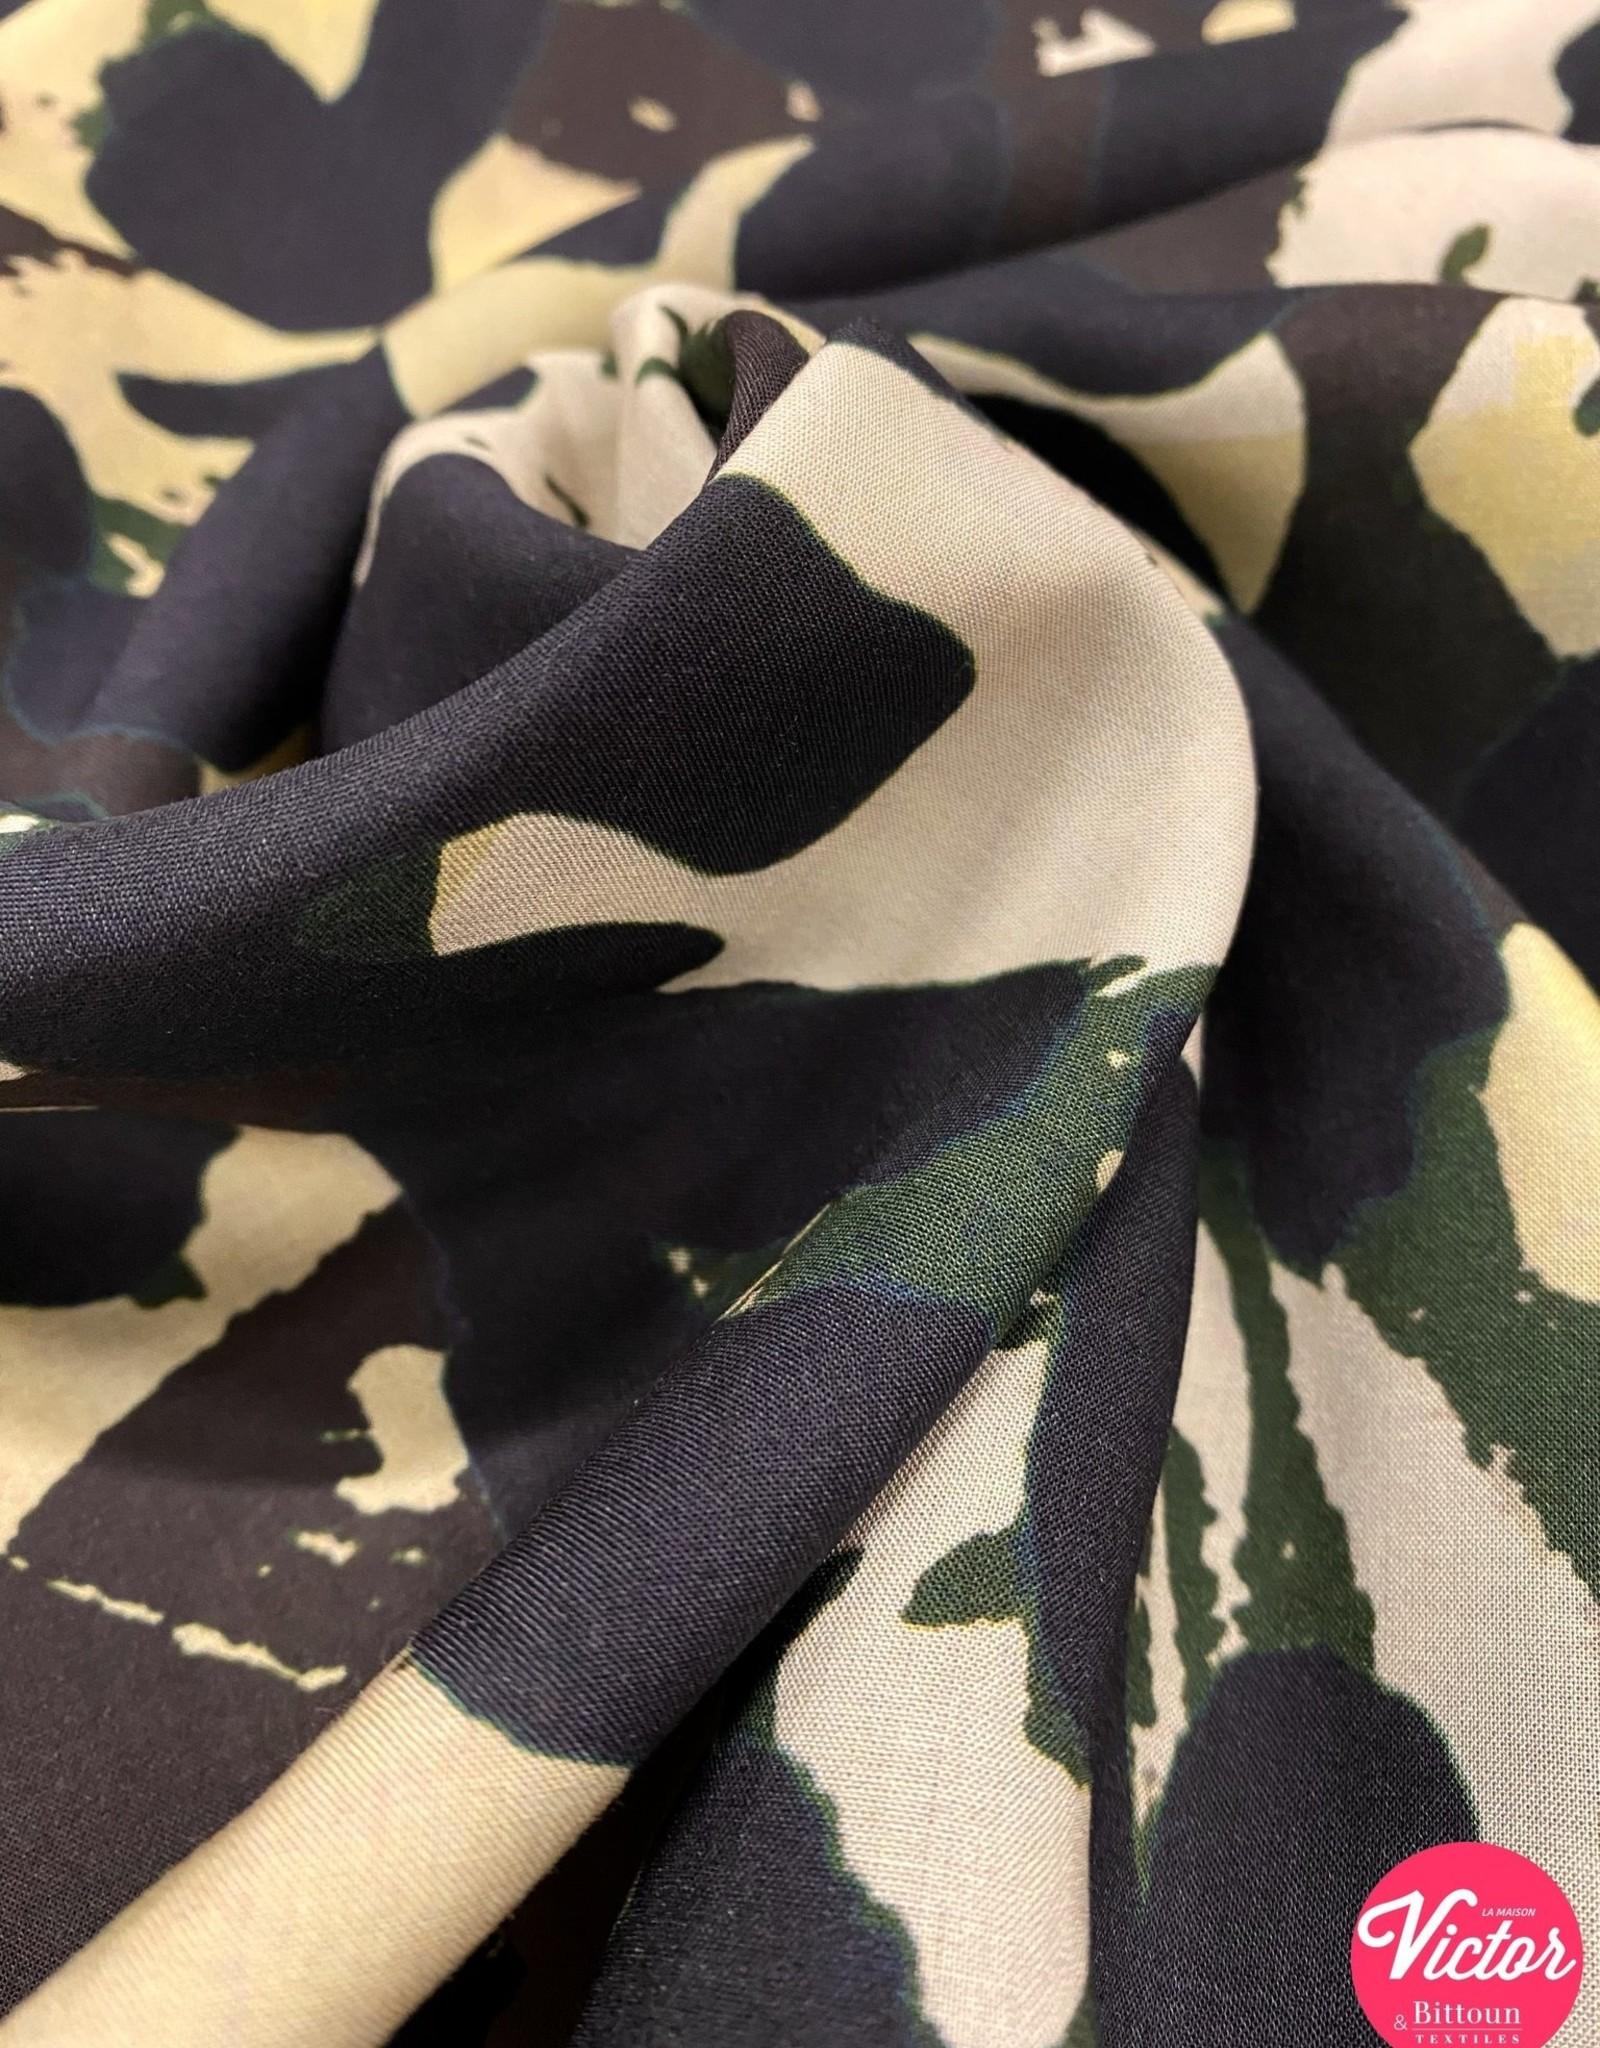 La Maison Victor COUPON Viscose LMV AIDA Jurk camouflage 150x140cm